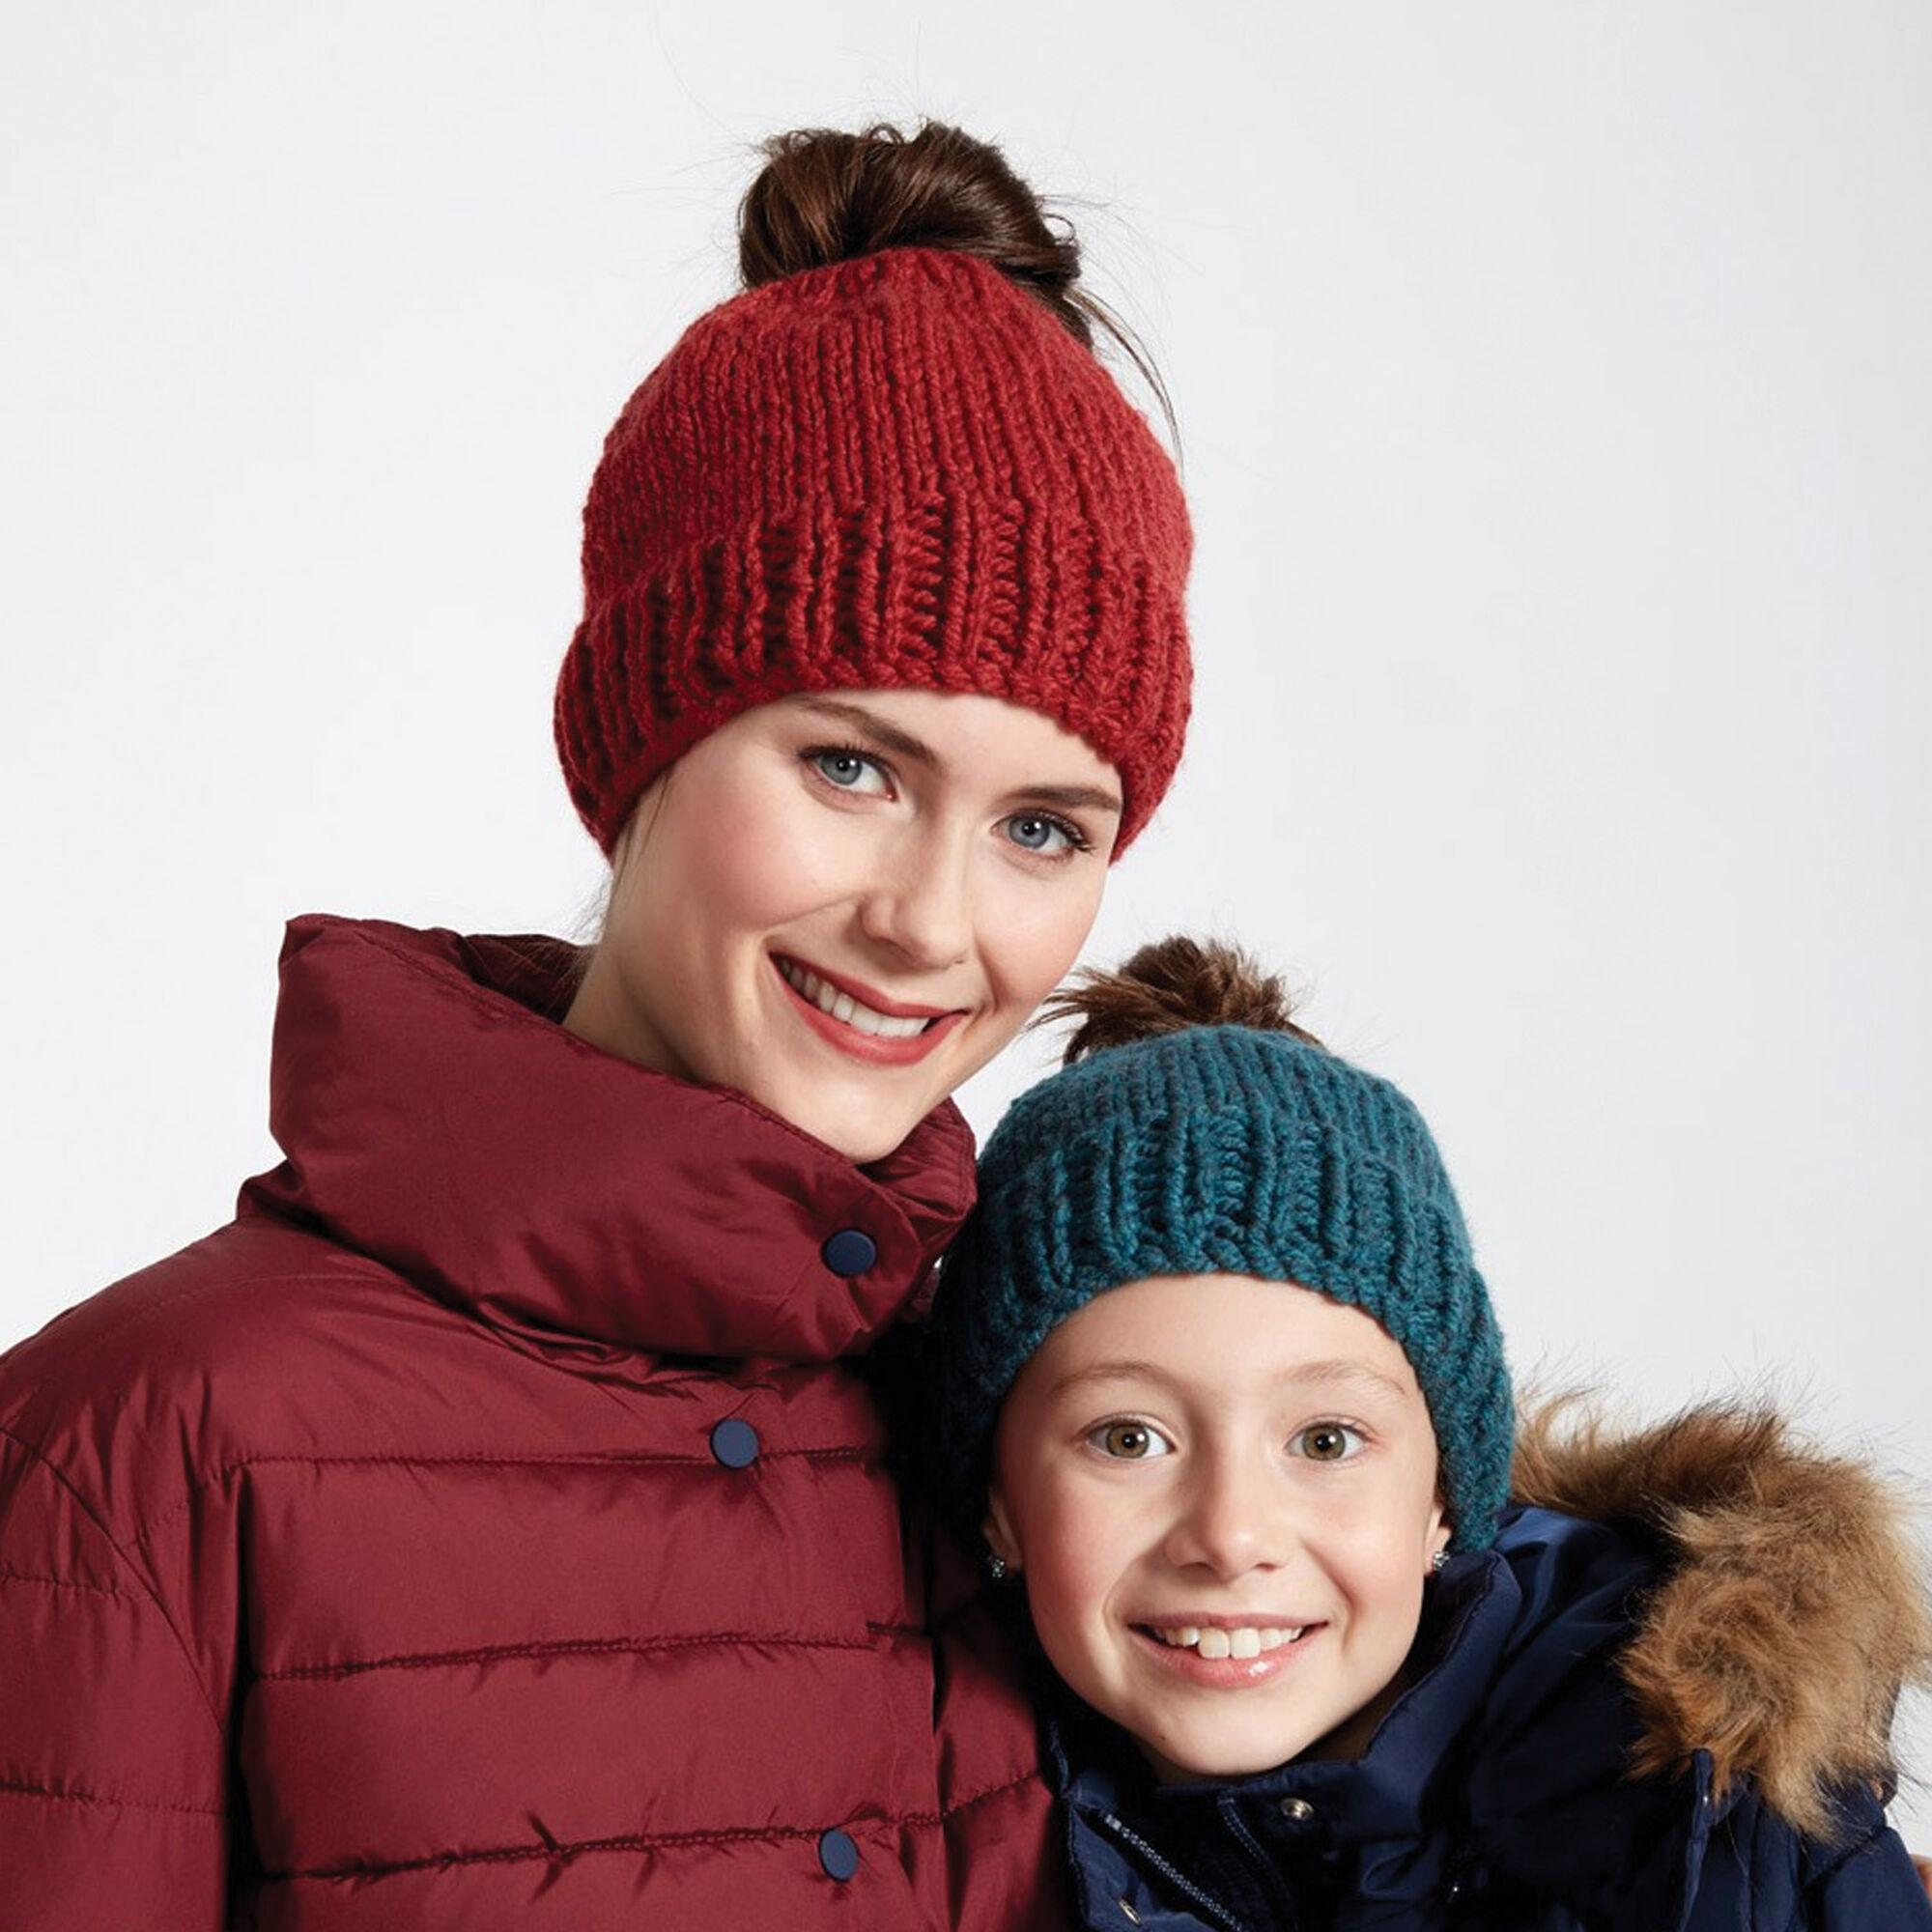 Bernat Family Fun Messy Bun Knit Hats, Adult | Yarnspirations